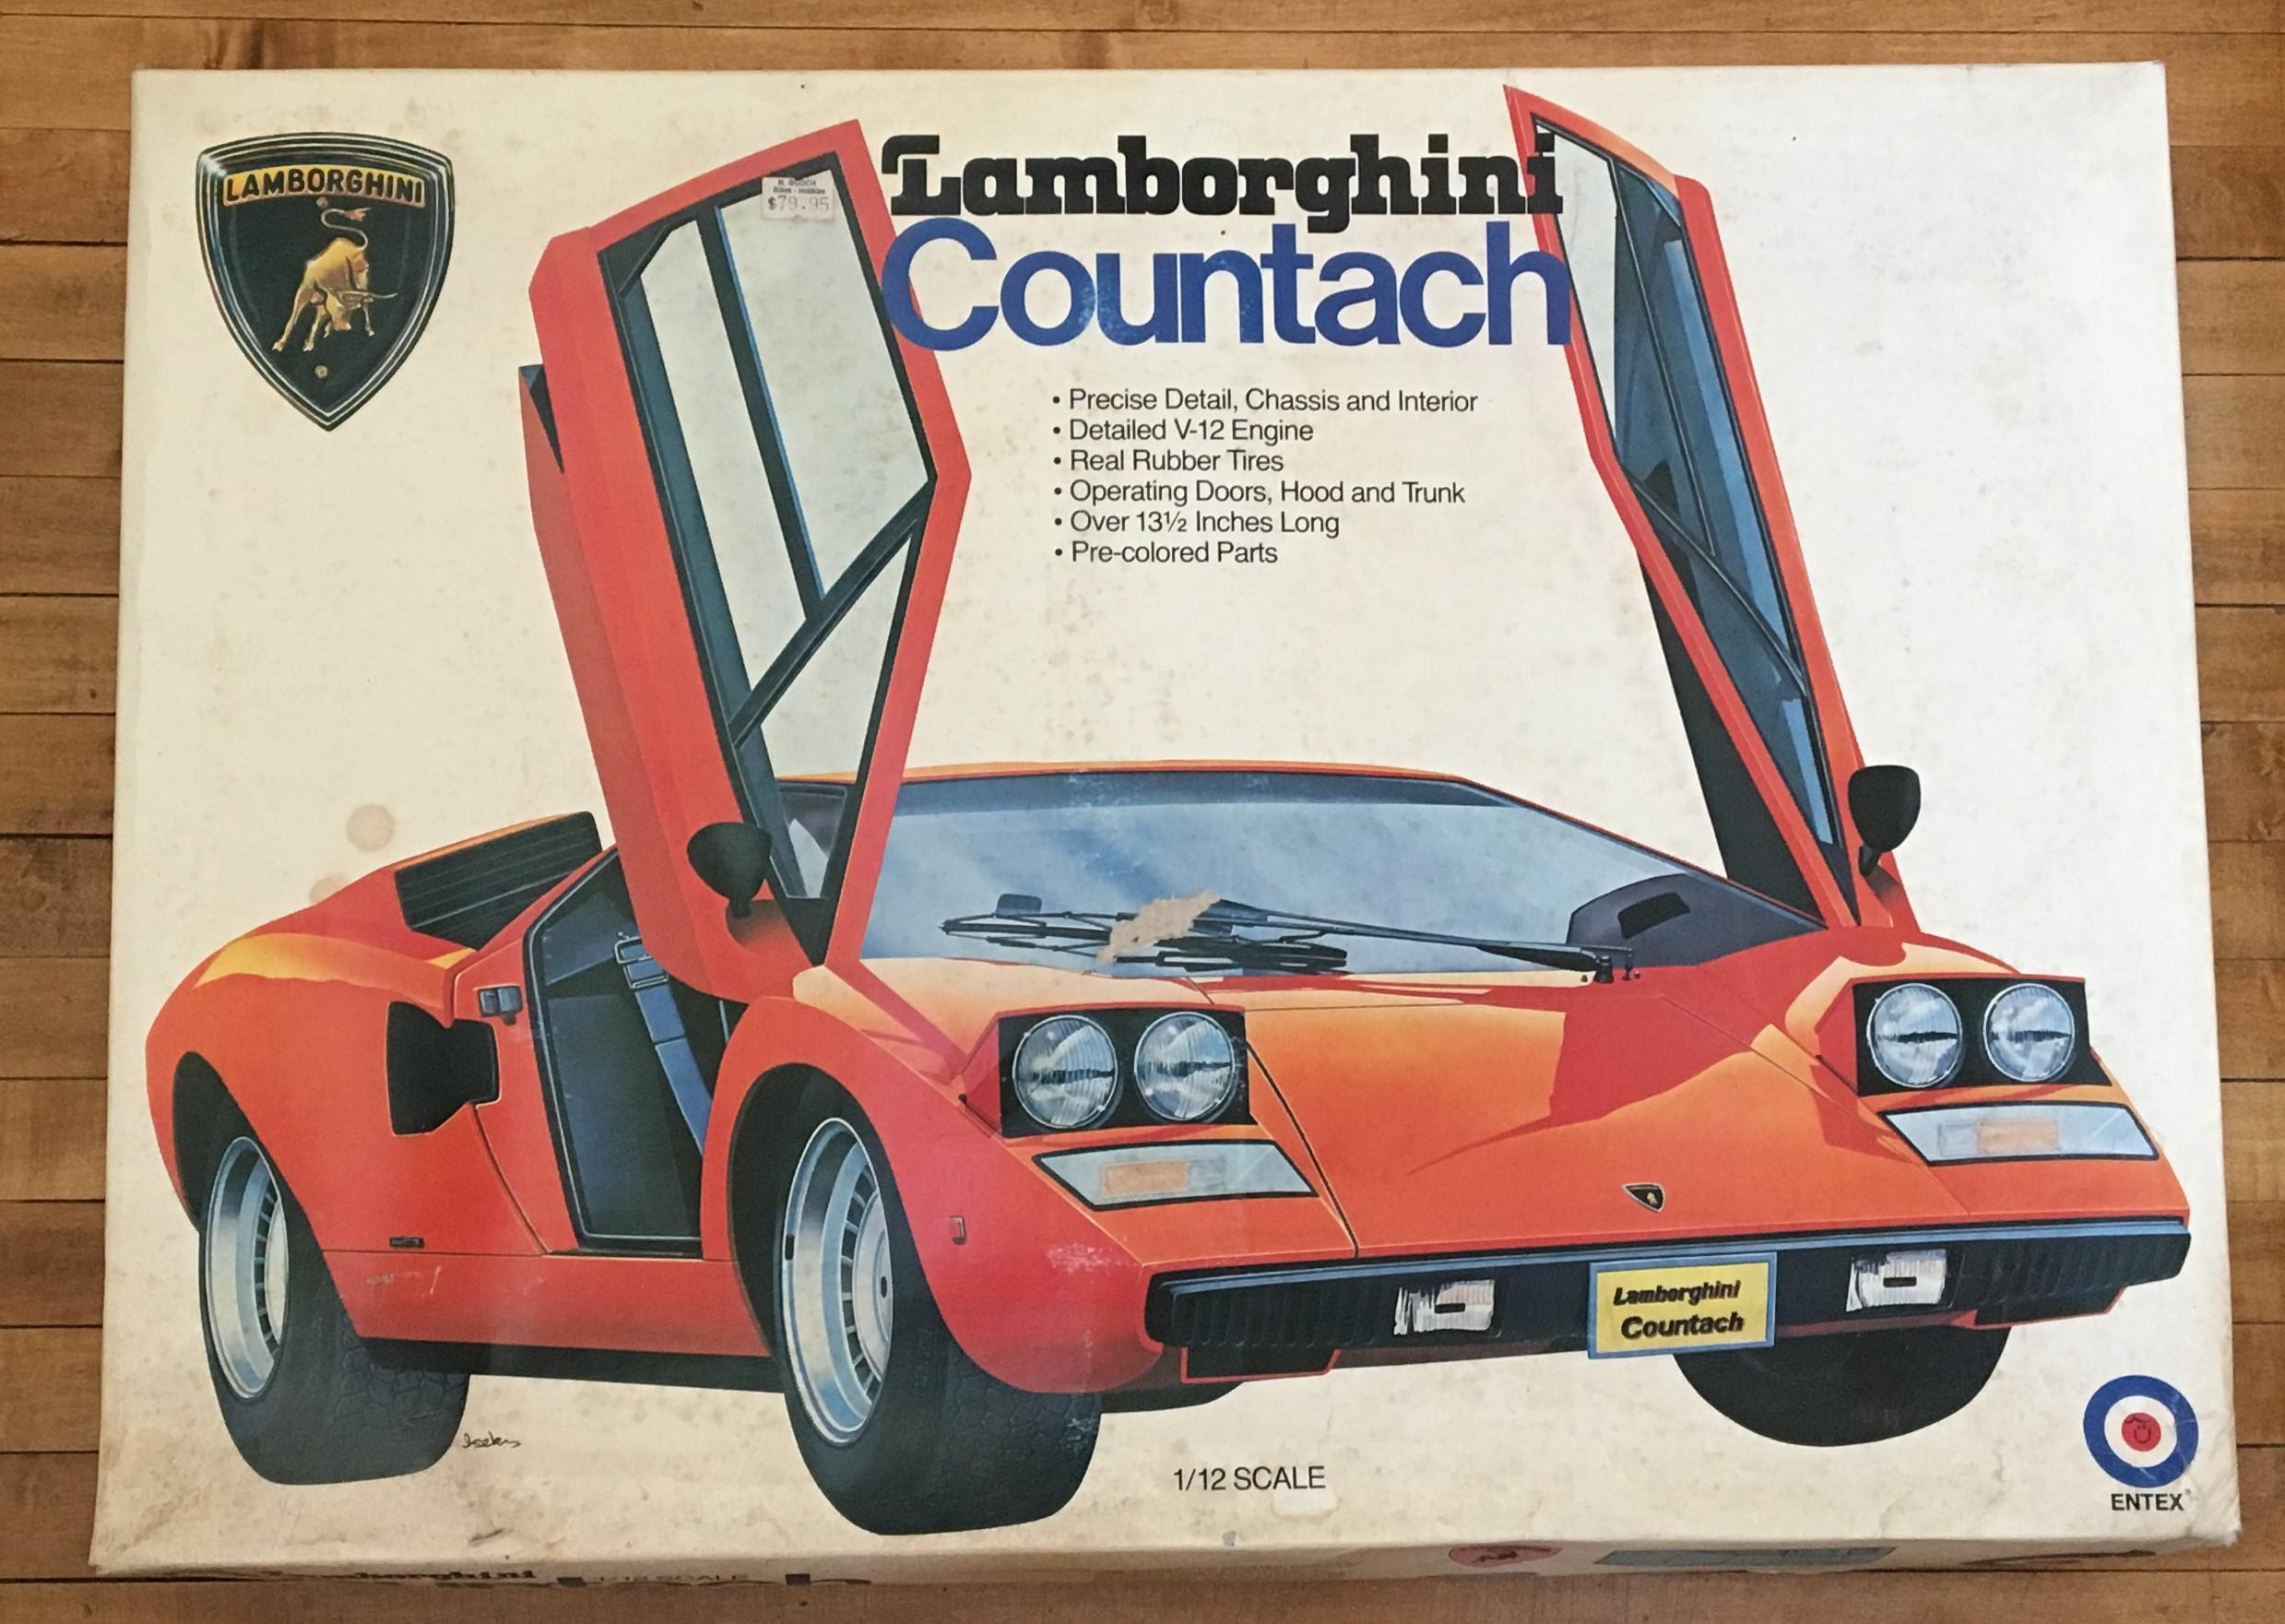 IMG_1474.JPG.89240246c67060ac78261751df8cbf33 Remarkable Lamborghini Countach In Real Racing 3 Cars Trend